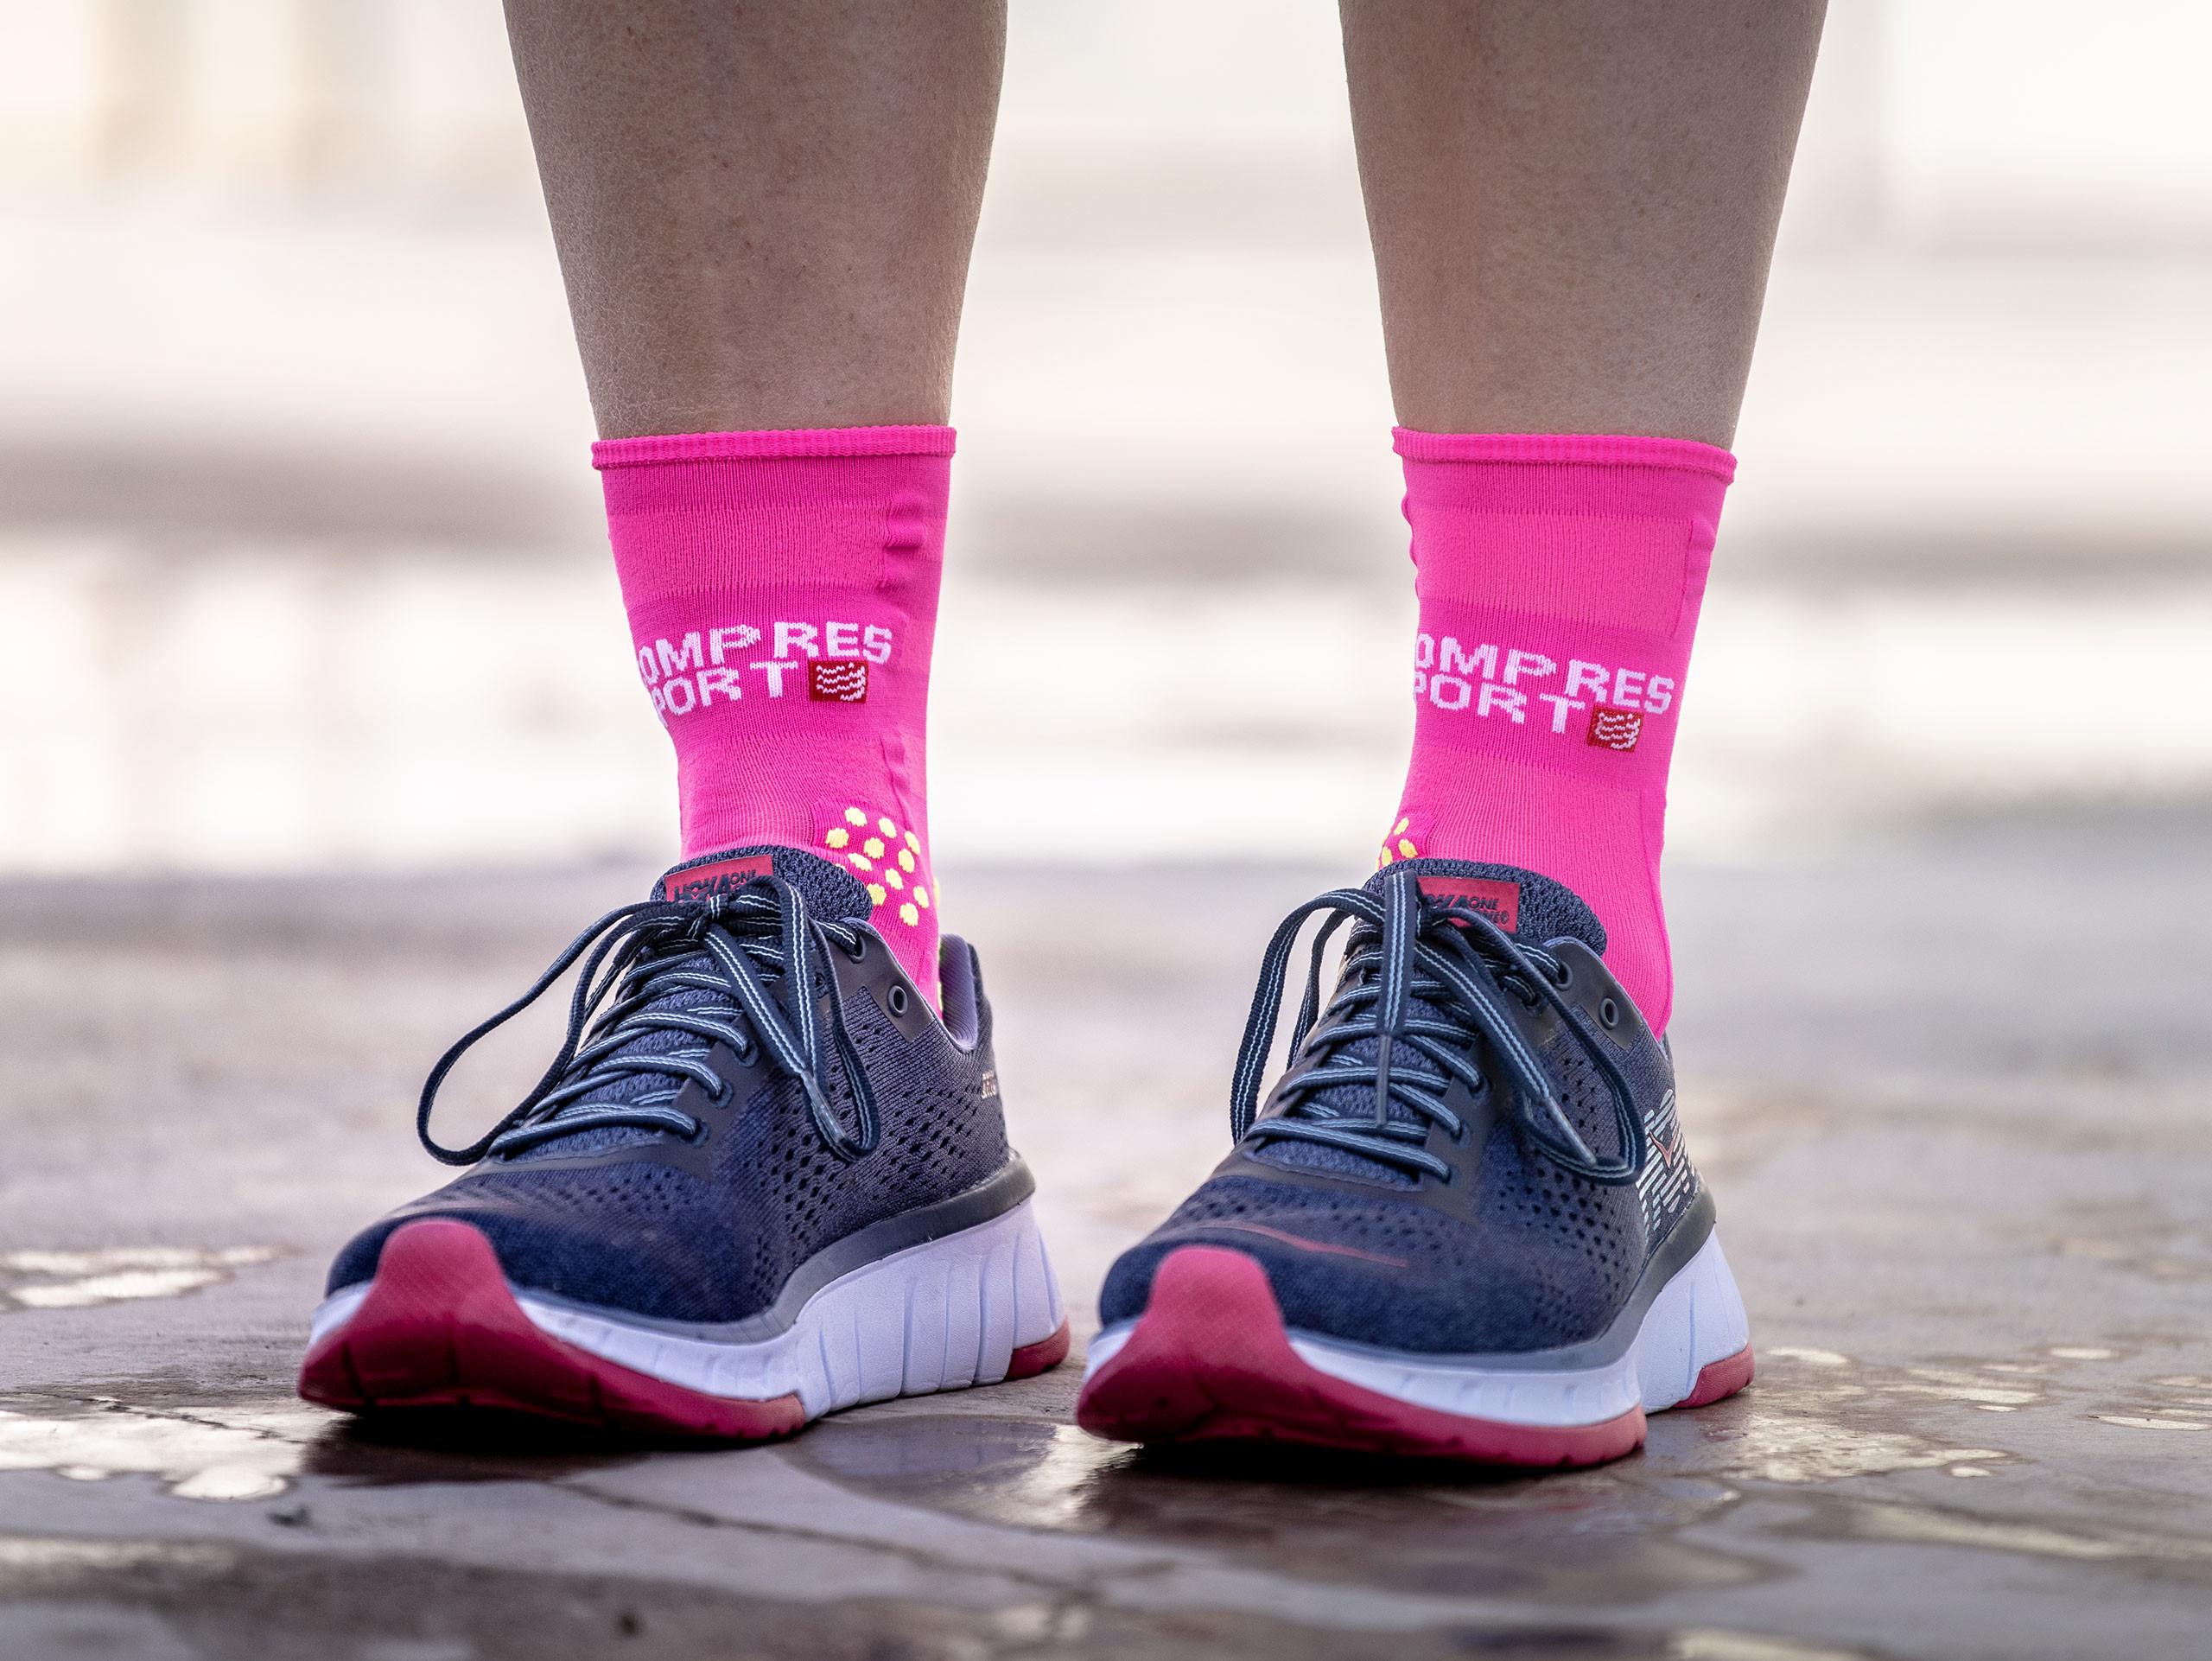 Pro Racing Socks v3.0 Run Ultralight Run High fluo pink